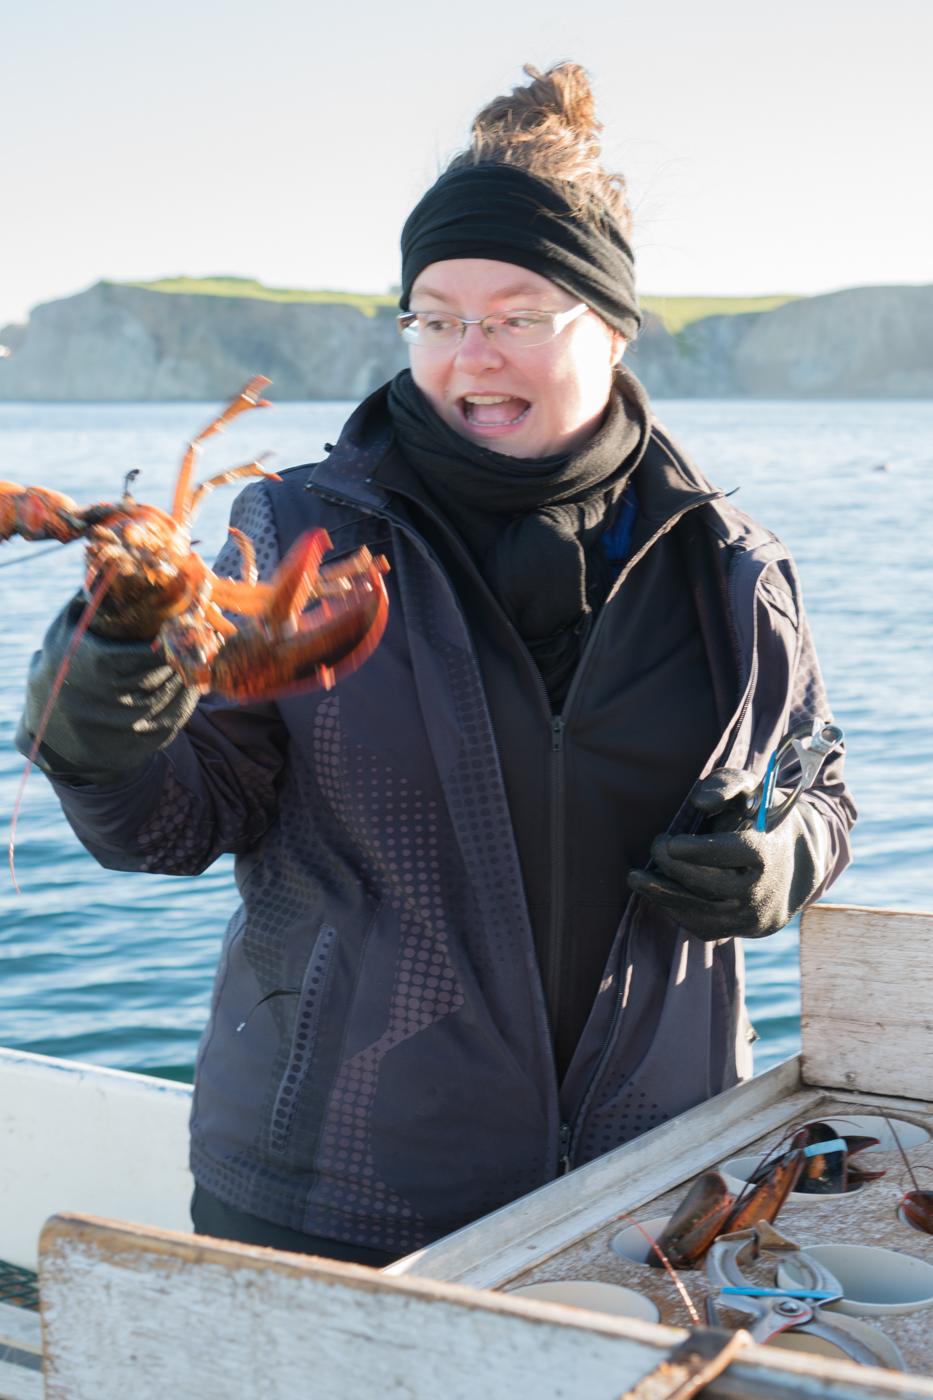 Jennifer pendant l'élastiquage de homards